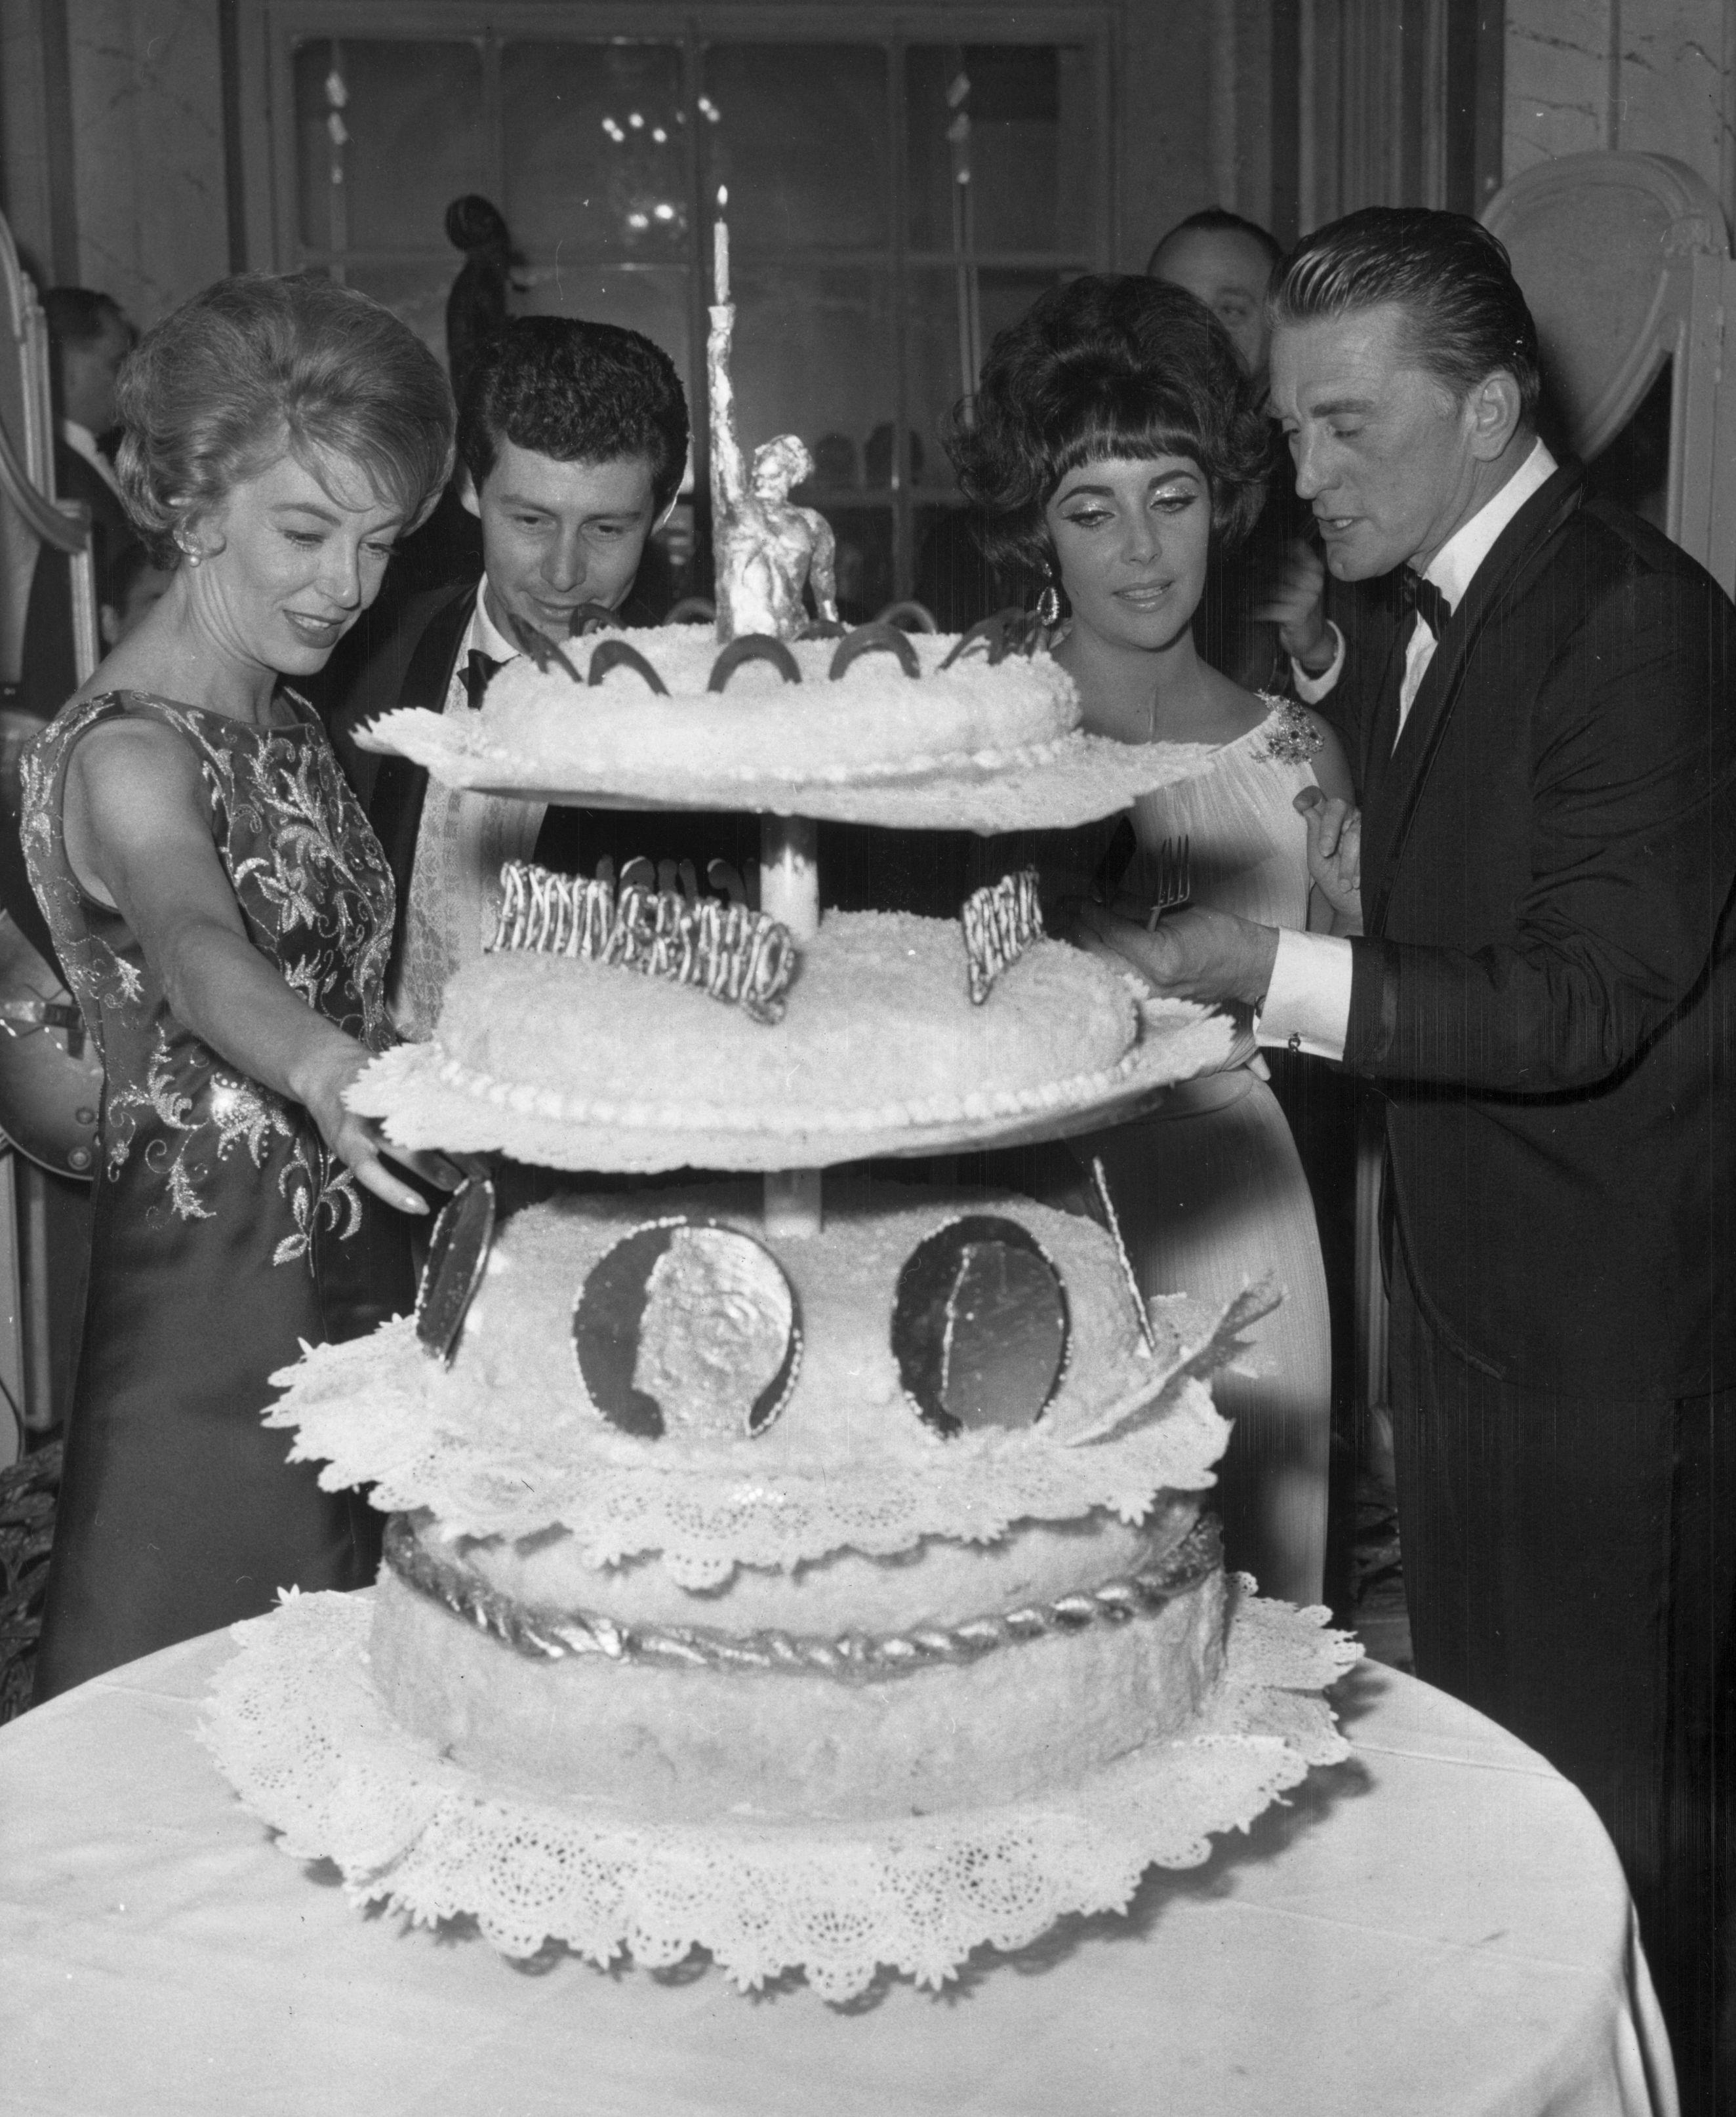 Anne Buydens and Kirk Douglas, Elizabeth Taylor and Eddie Fisher